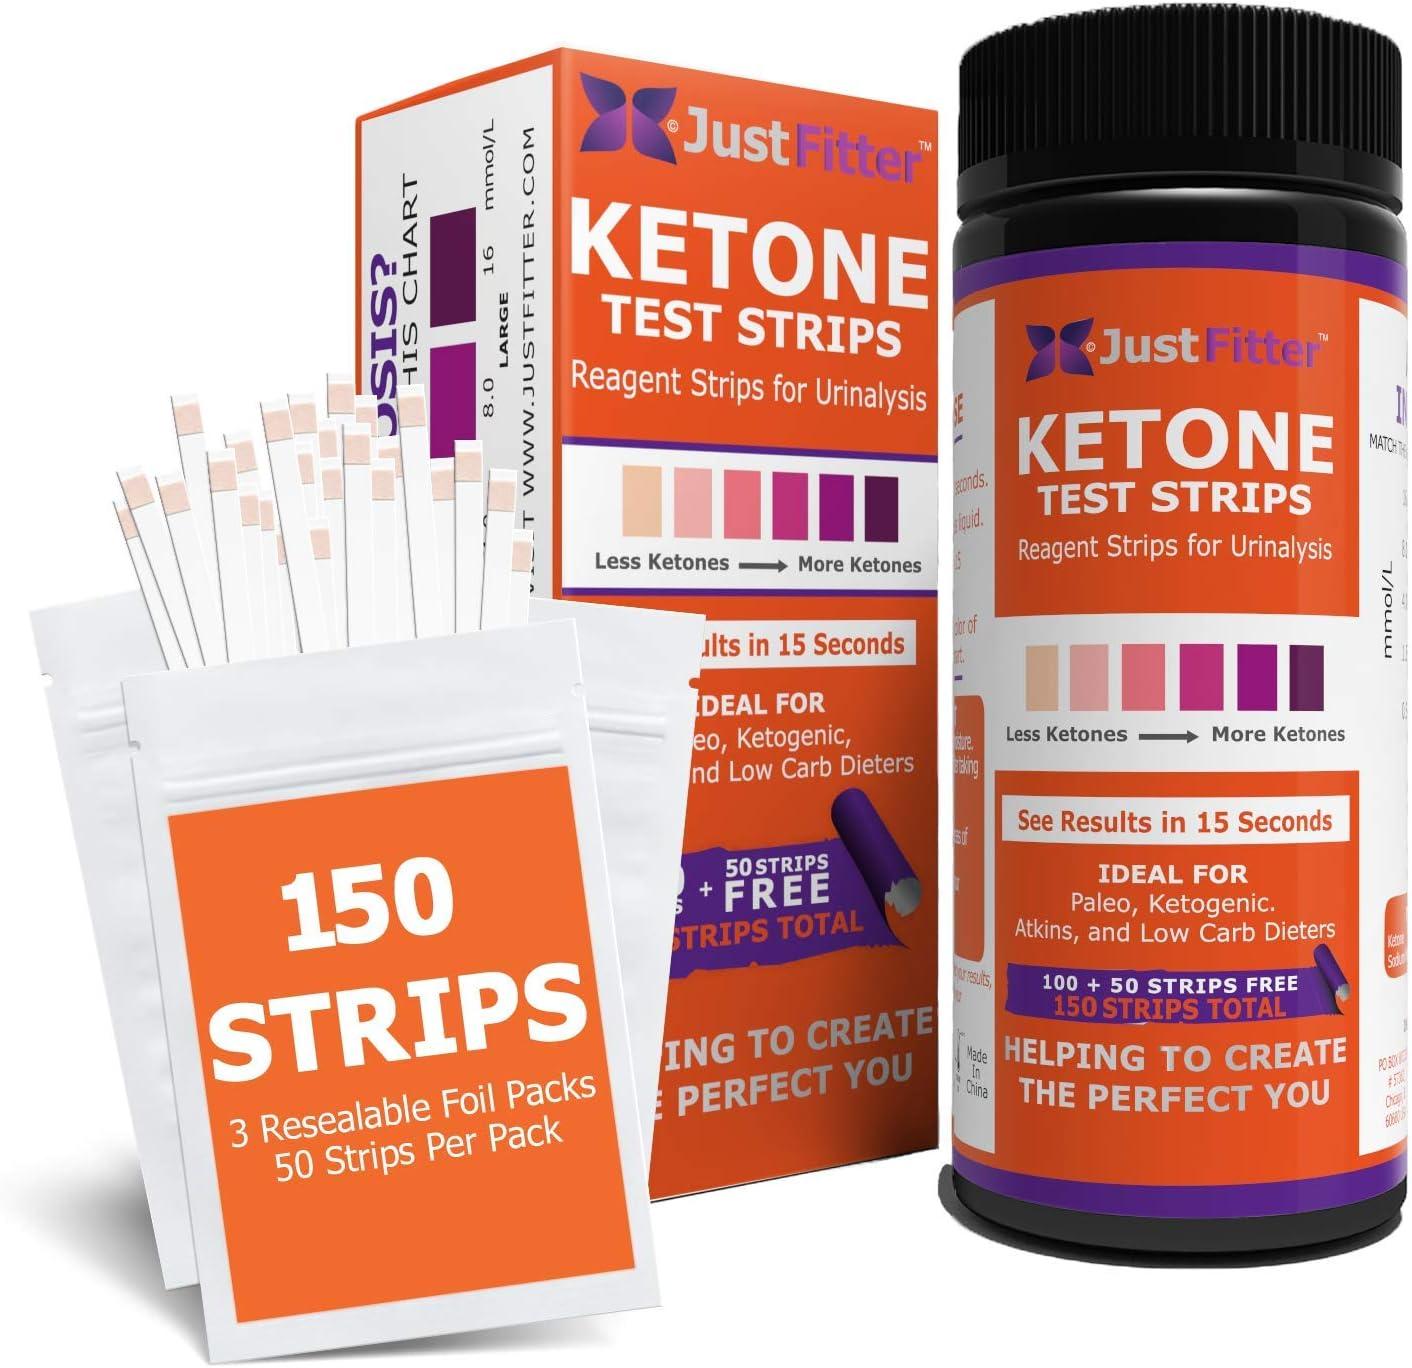 keto diet and ketone strips